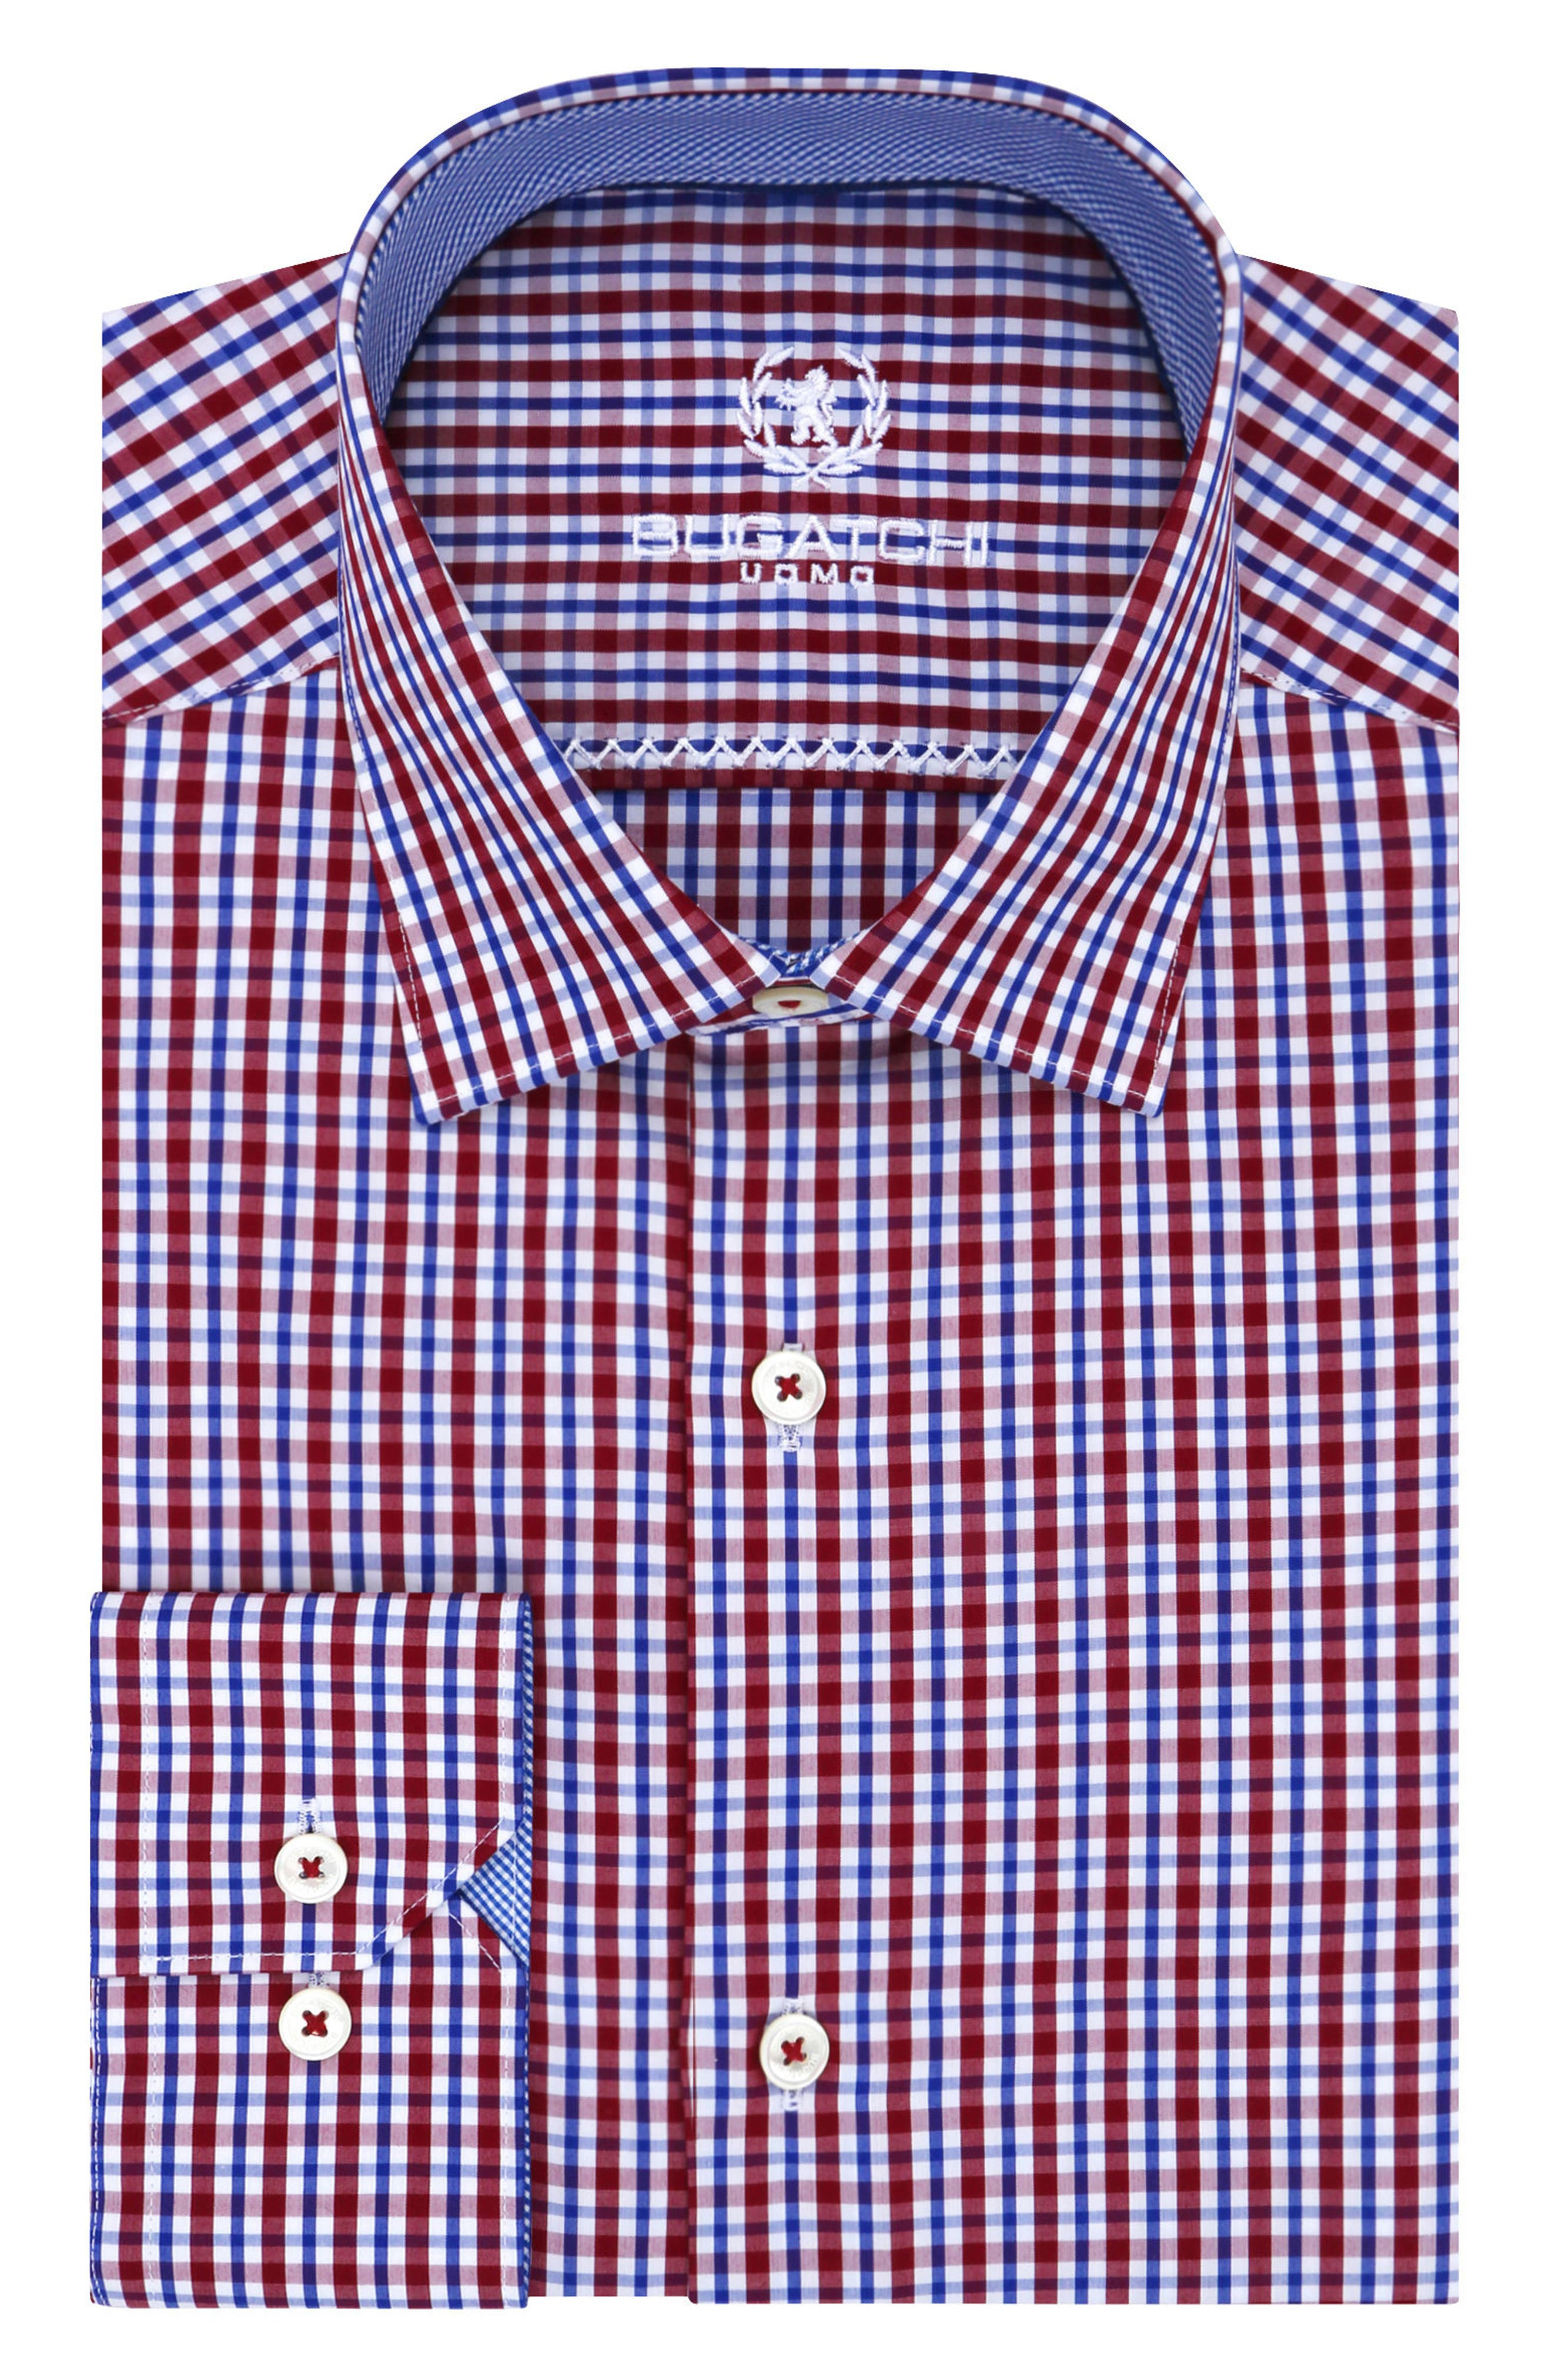 Bugatchi Trim Fit Plaid Dress Shirt (Regular & Big)